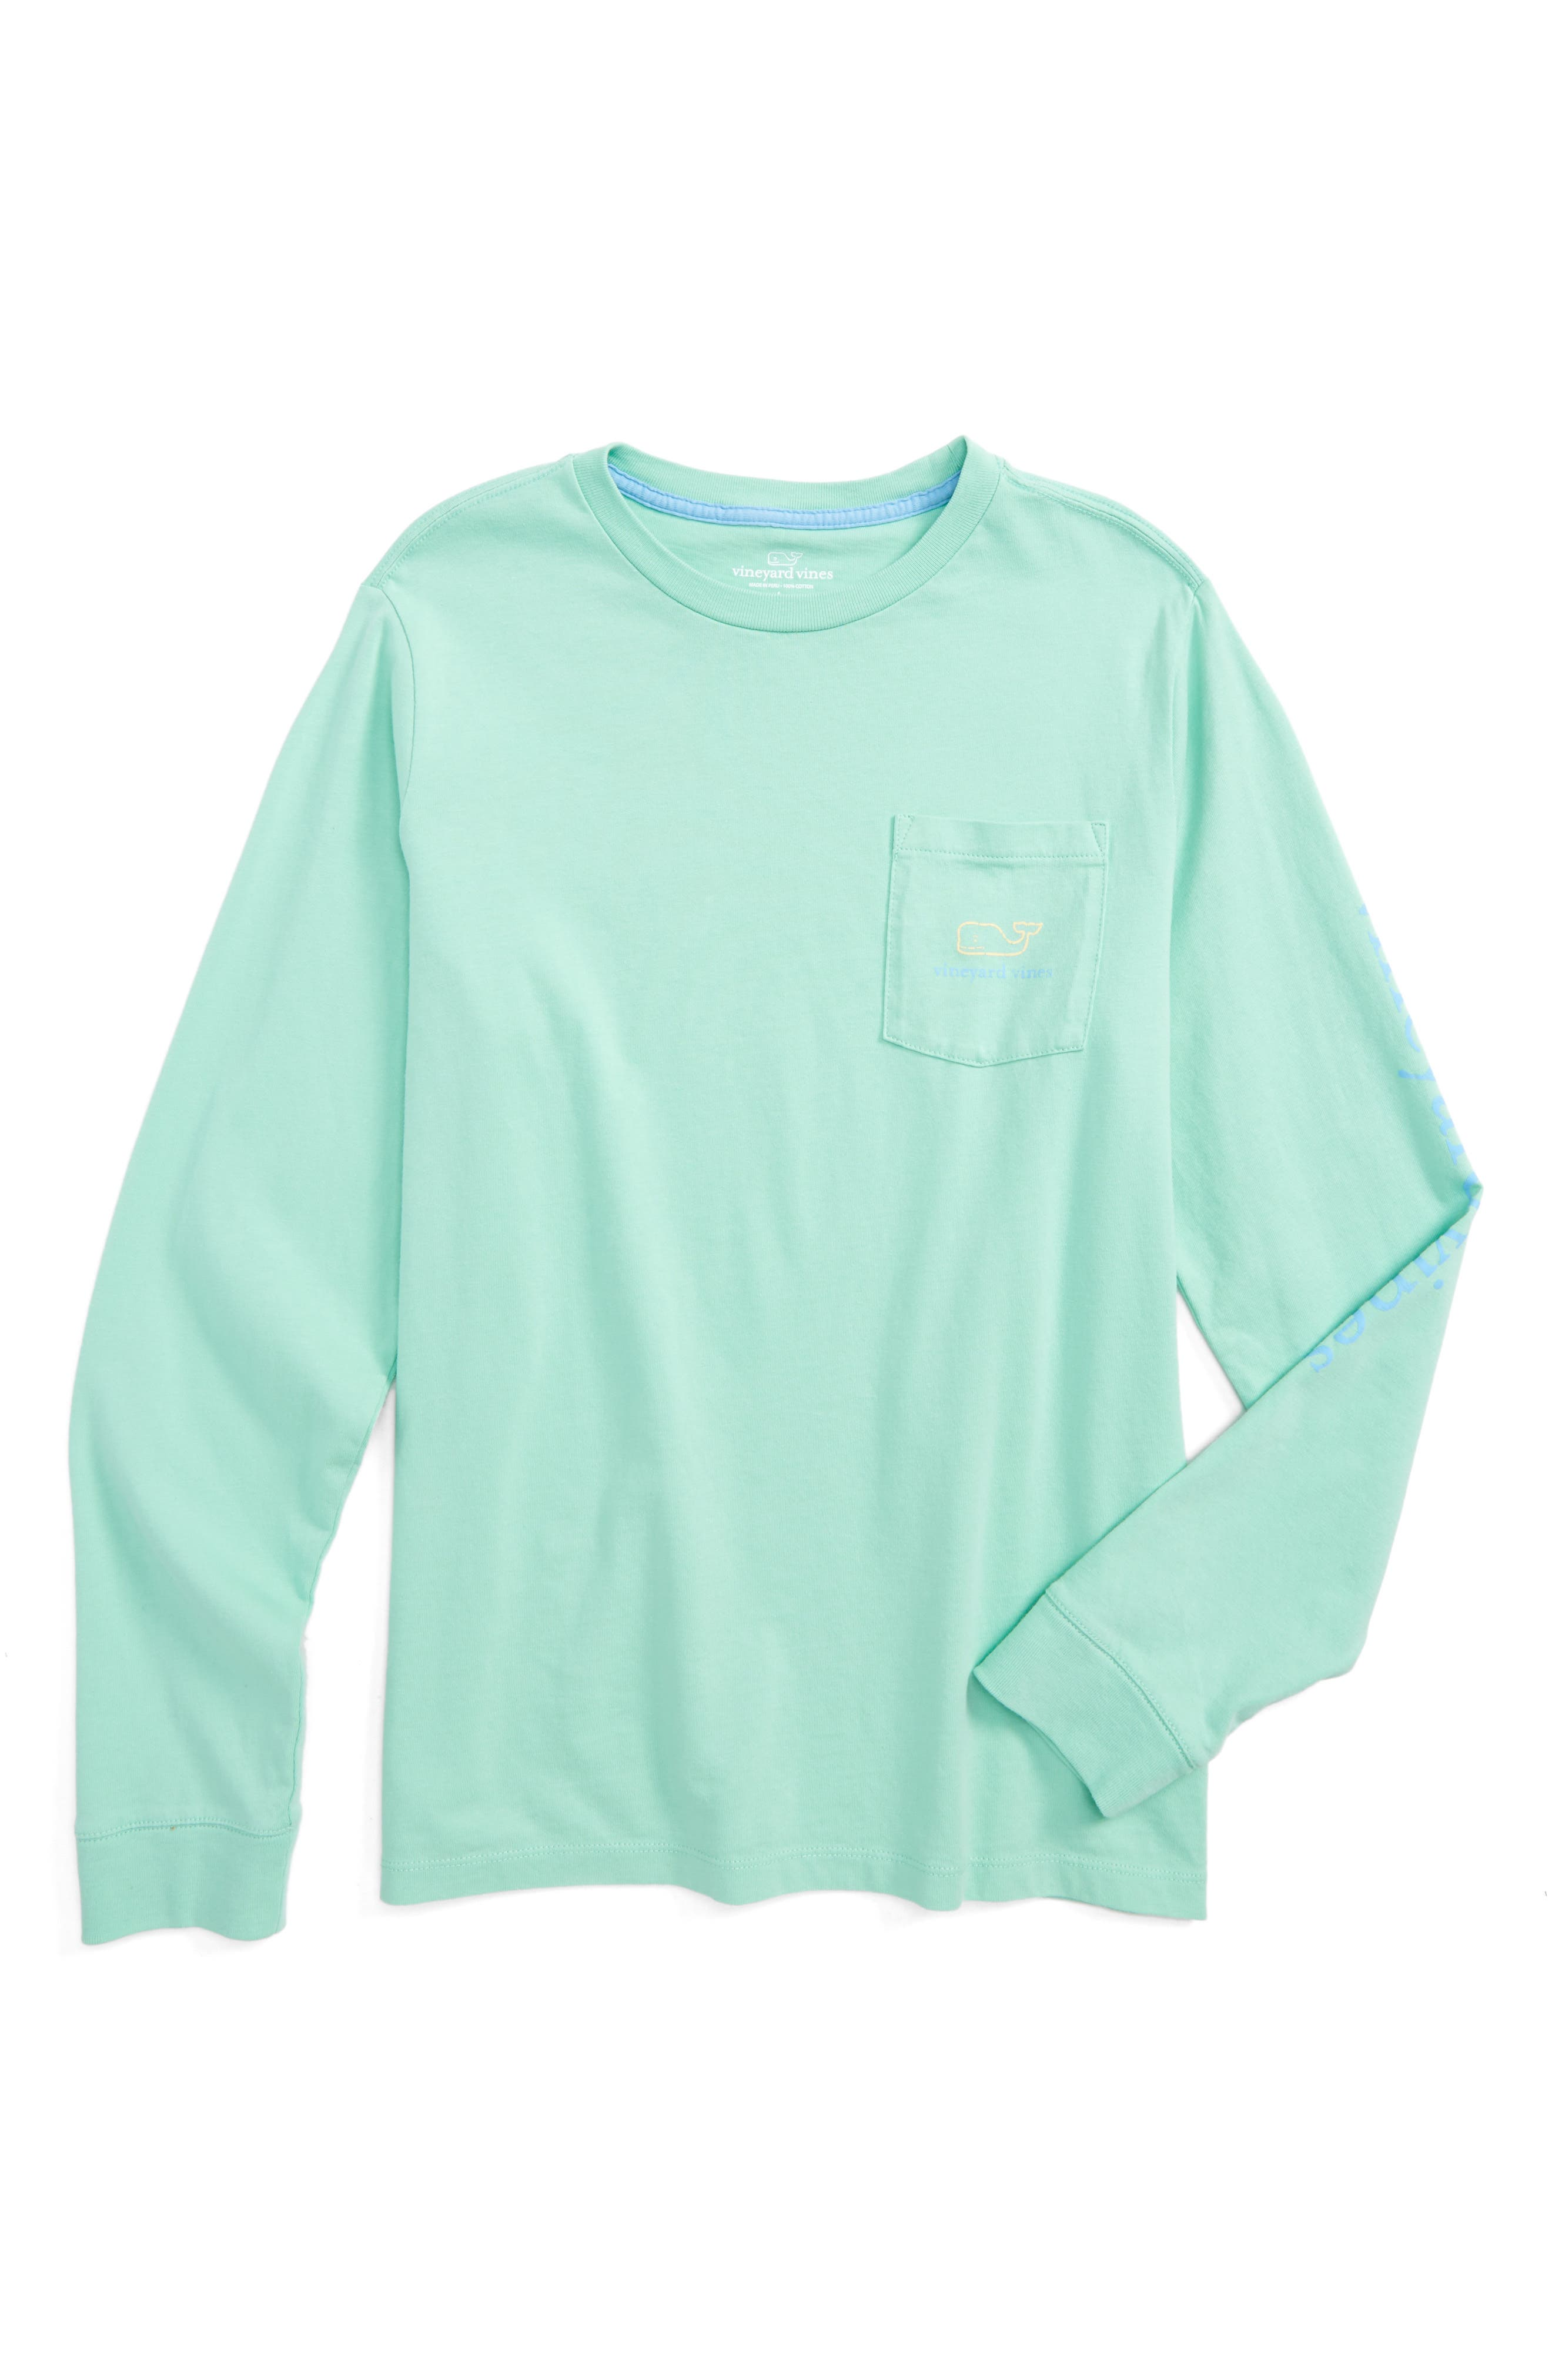 Vintage Whale Long Sleeve Pocket T-Shirt,                             Main thumbnail 1, color,                             343